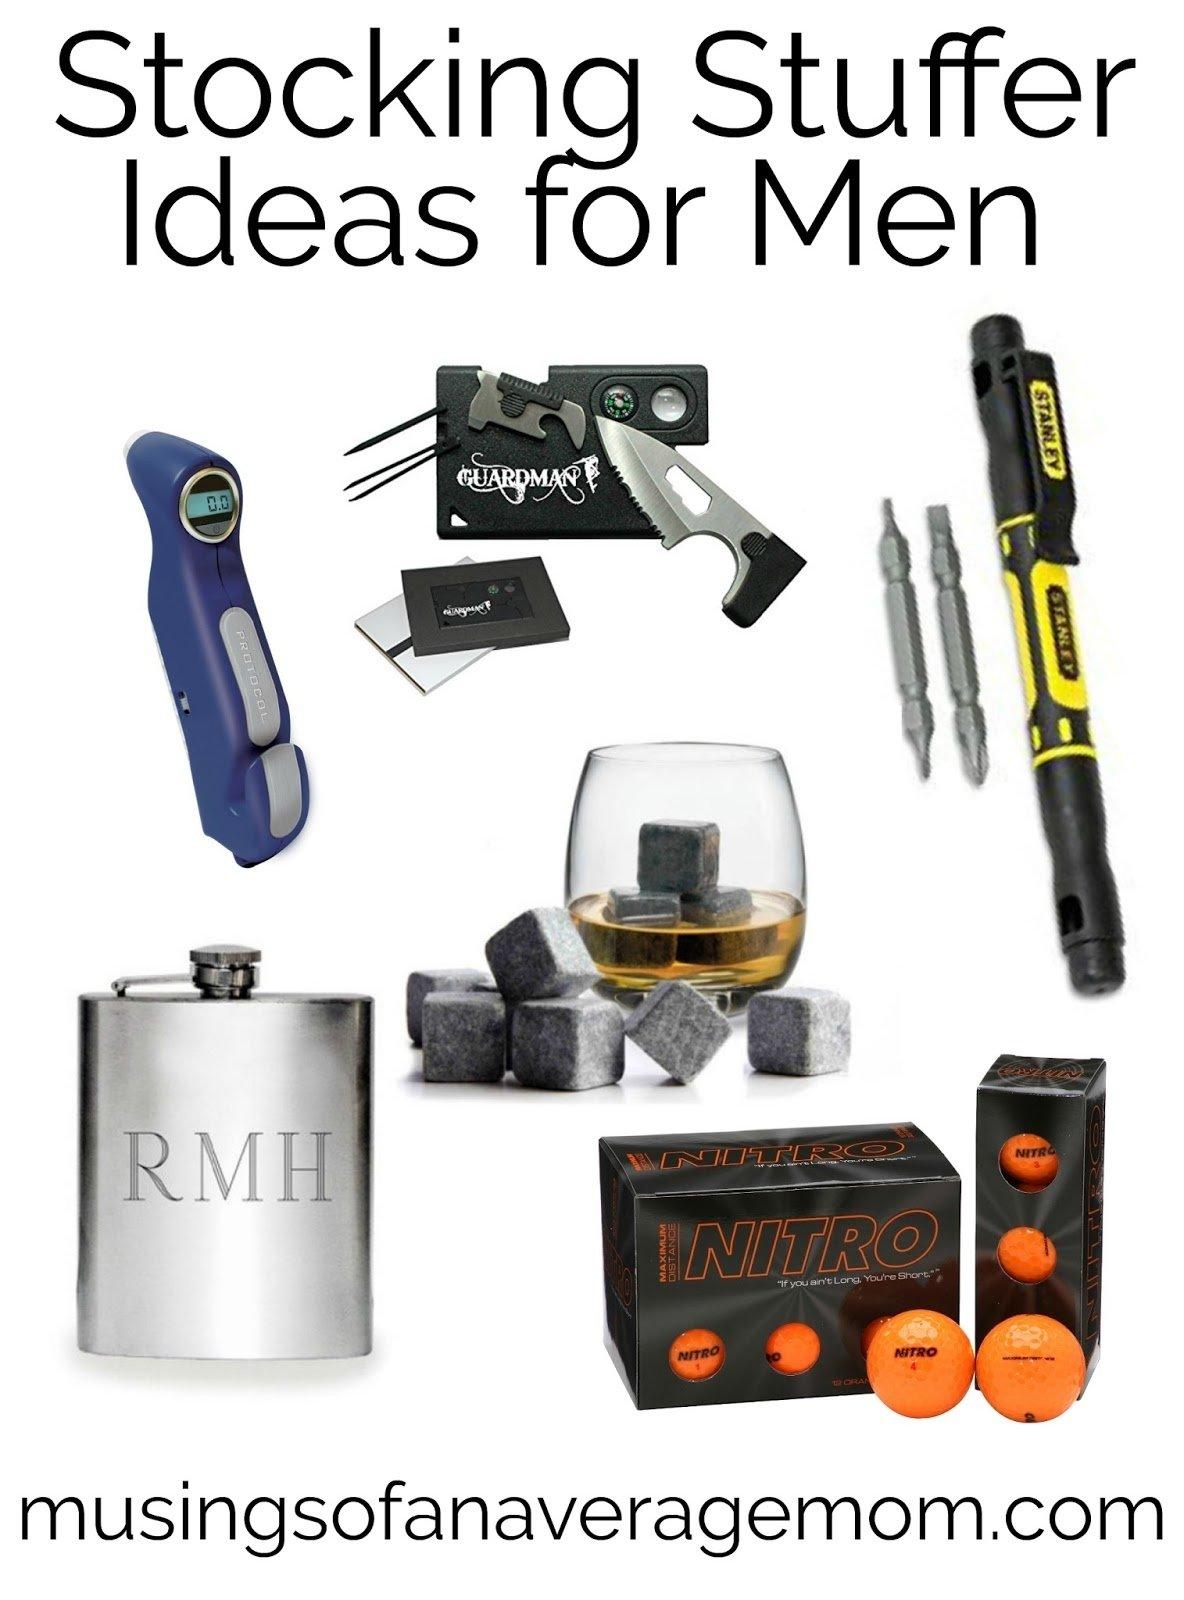 10 Fabulous Stocking Stuffers For Men Ideas musings of an average mom stocking stuffers for men 2 2020